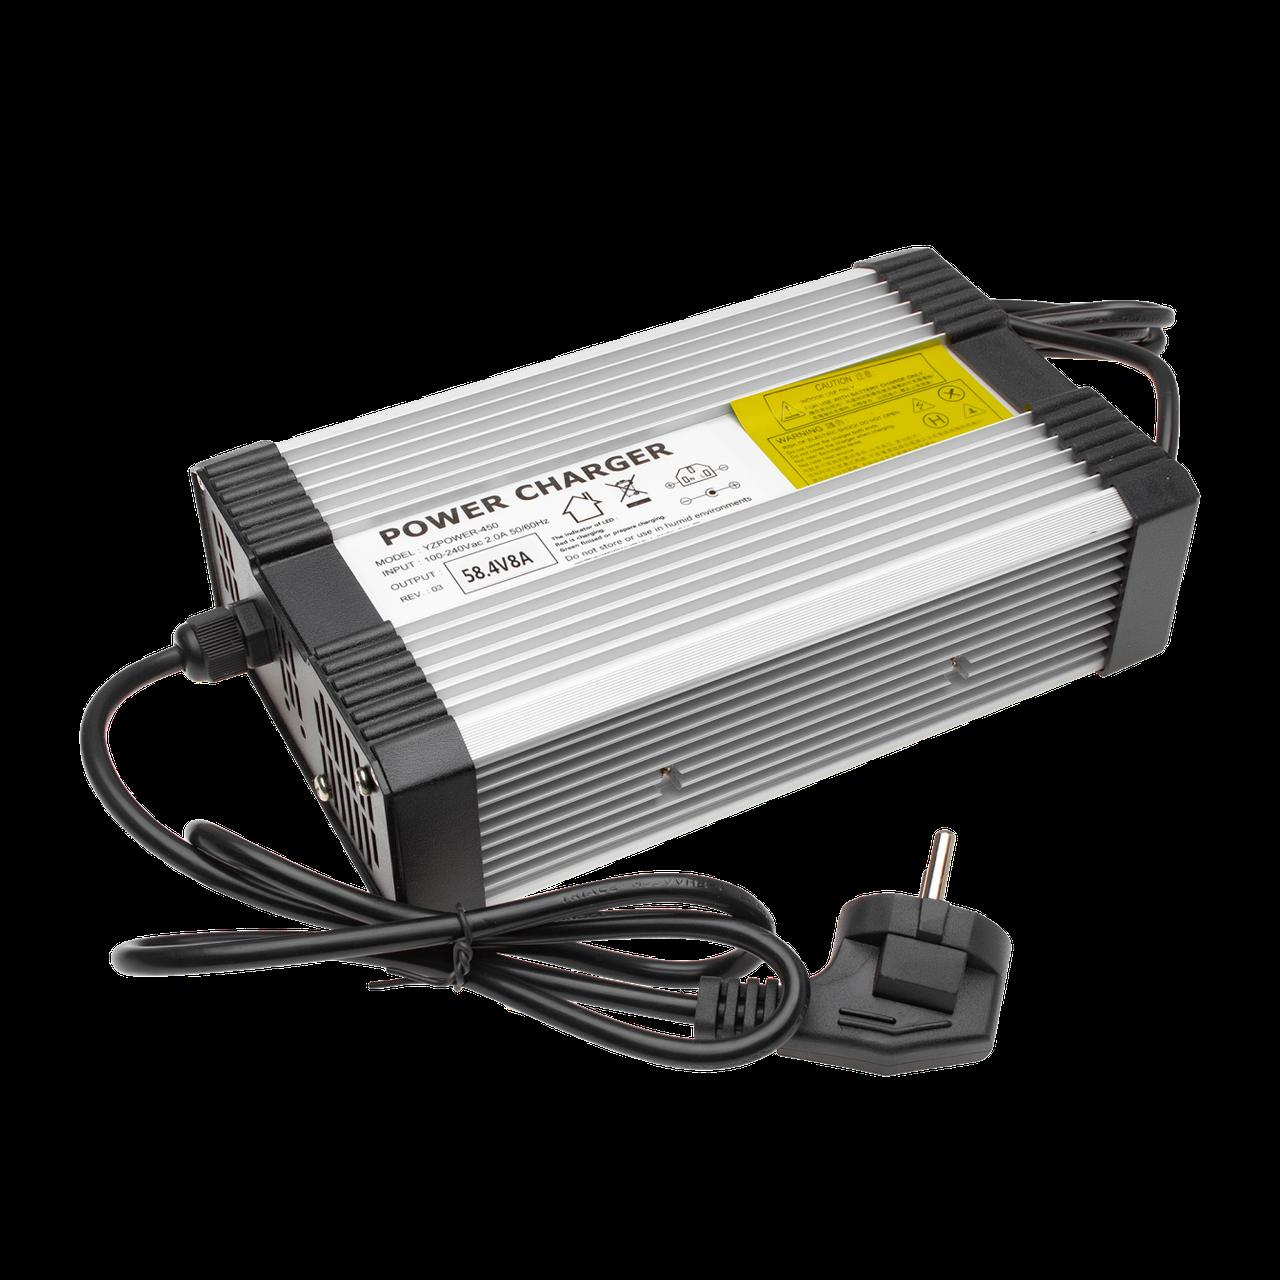 Зарядное устройство для аккумуляторов 48V(58.4V)-8A-384W